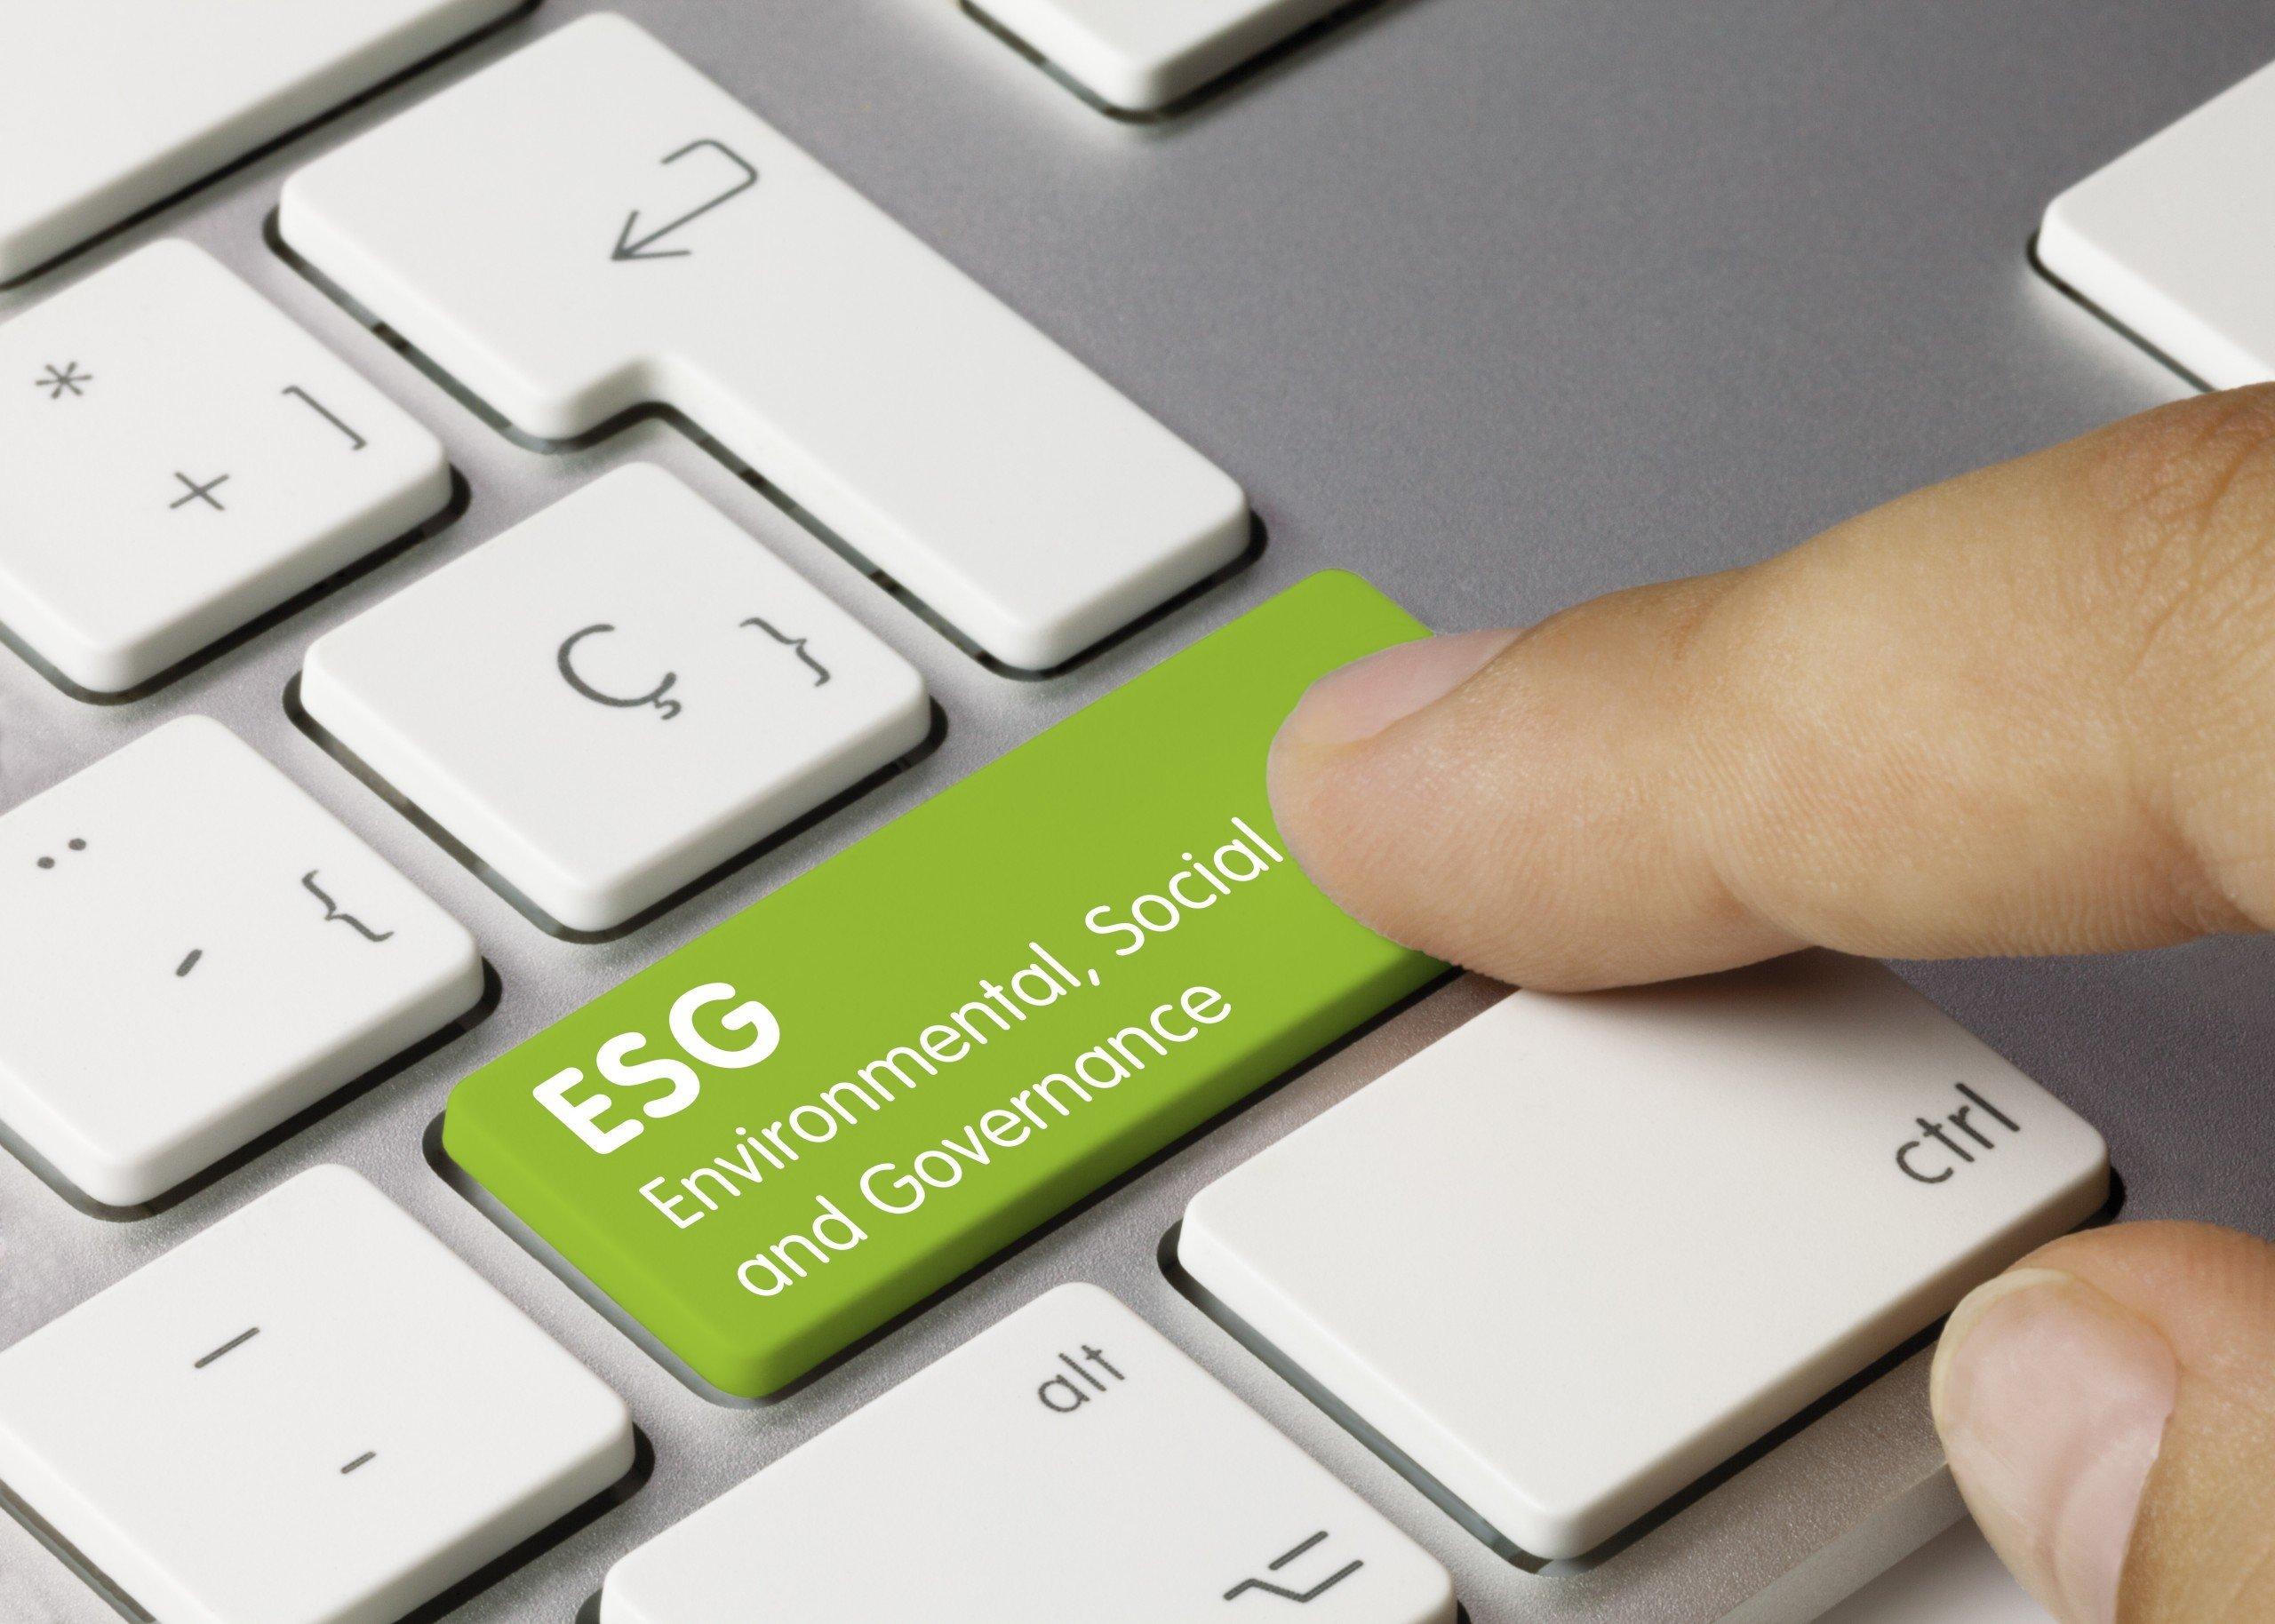 green ESG button on keyboard